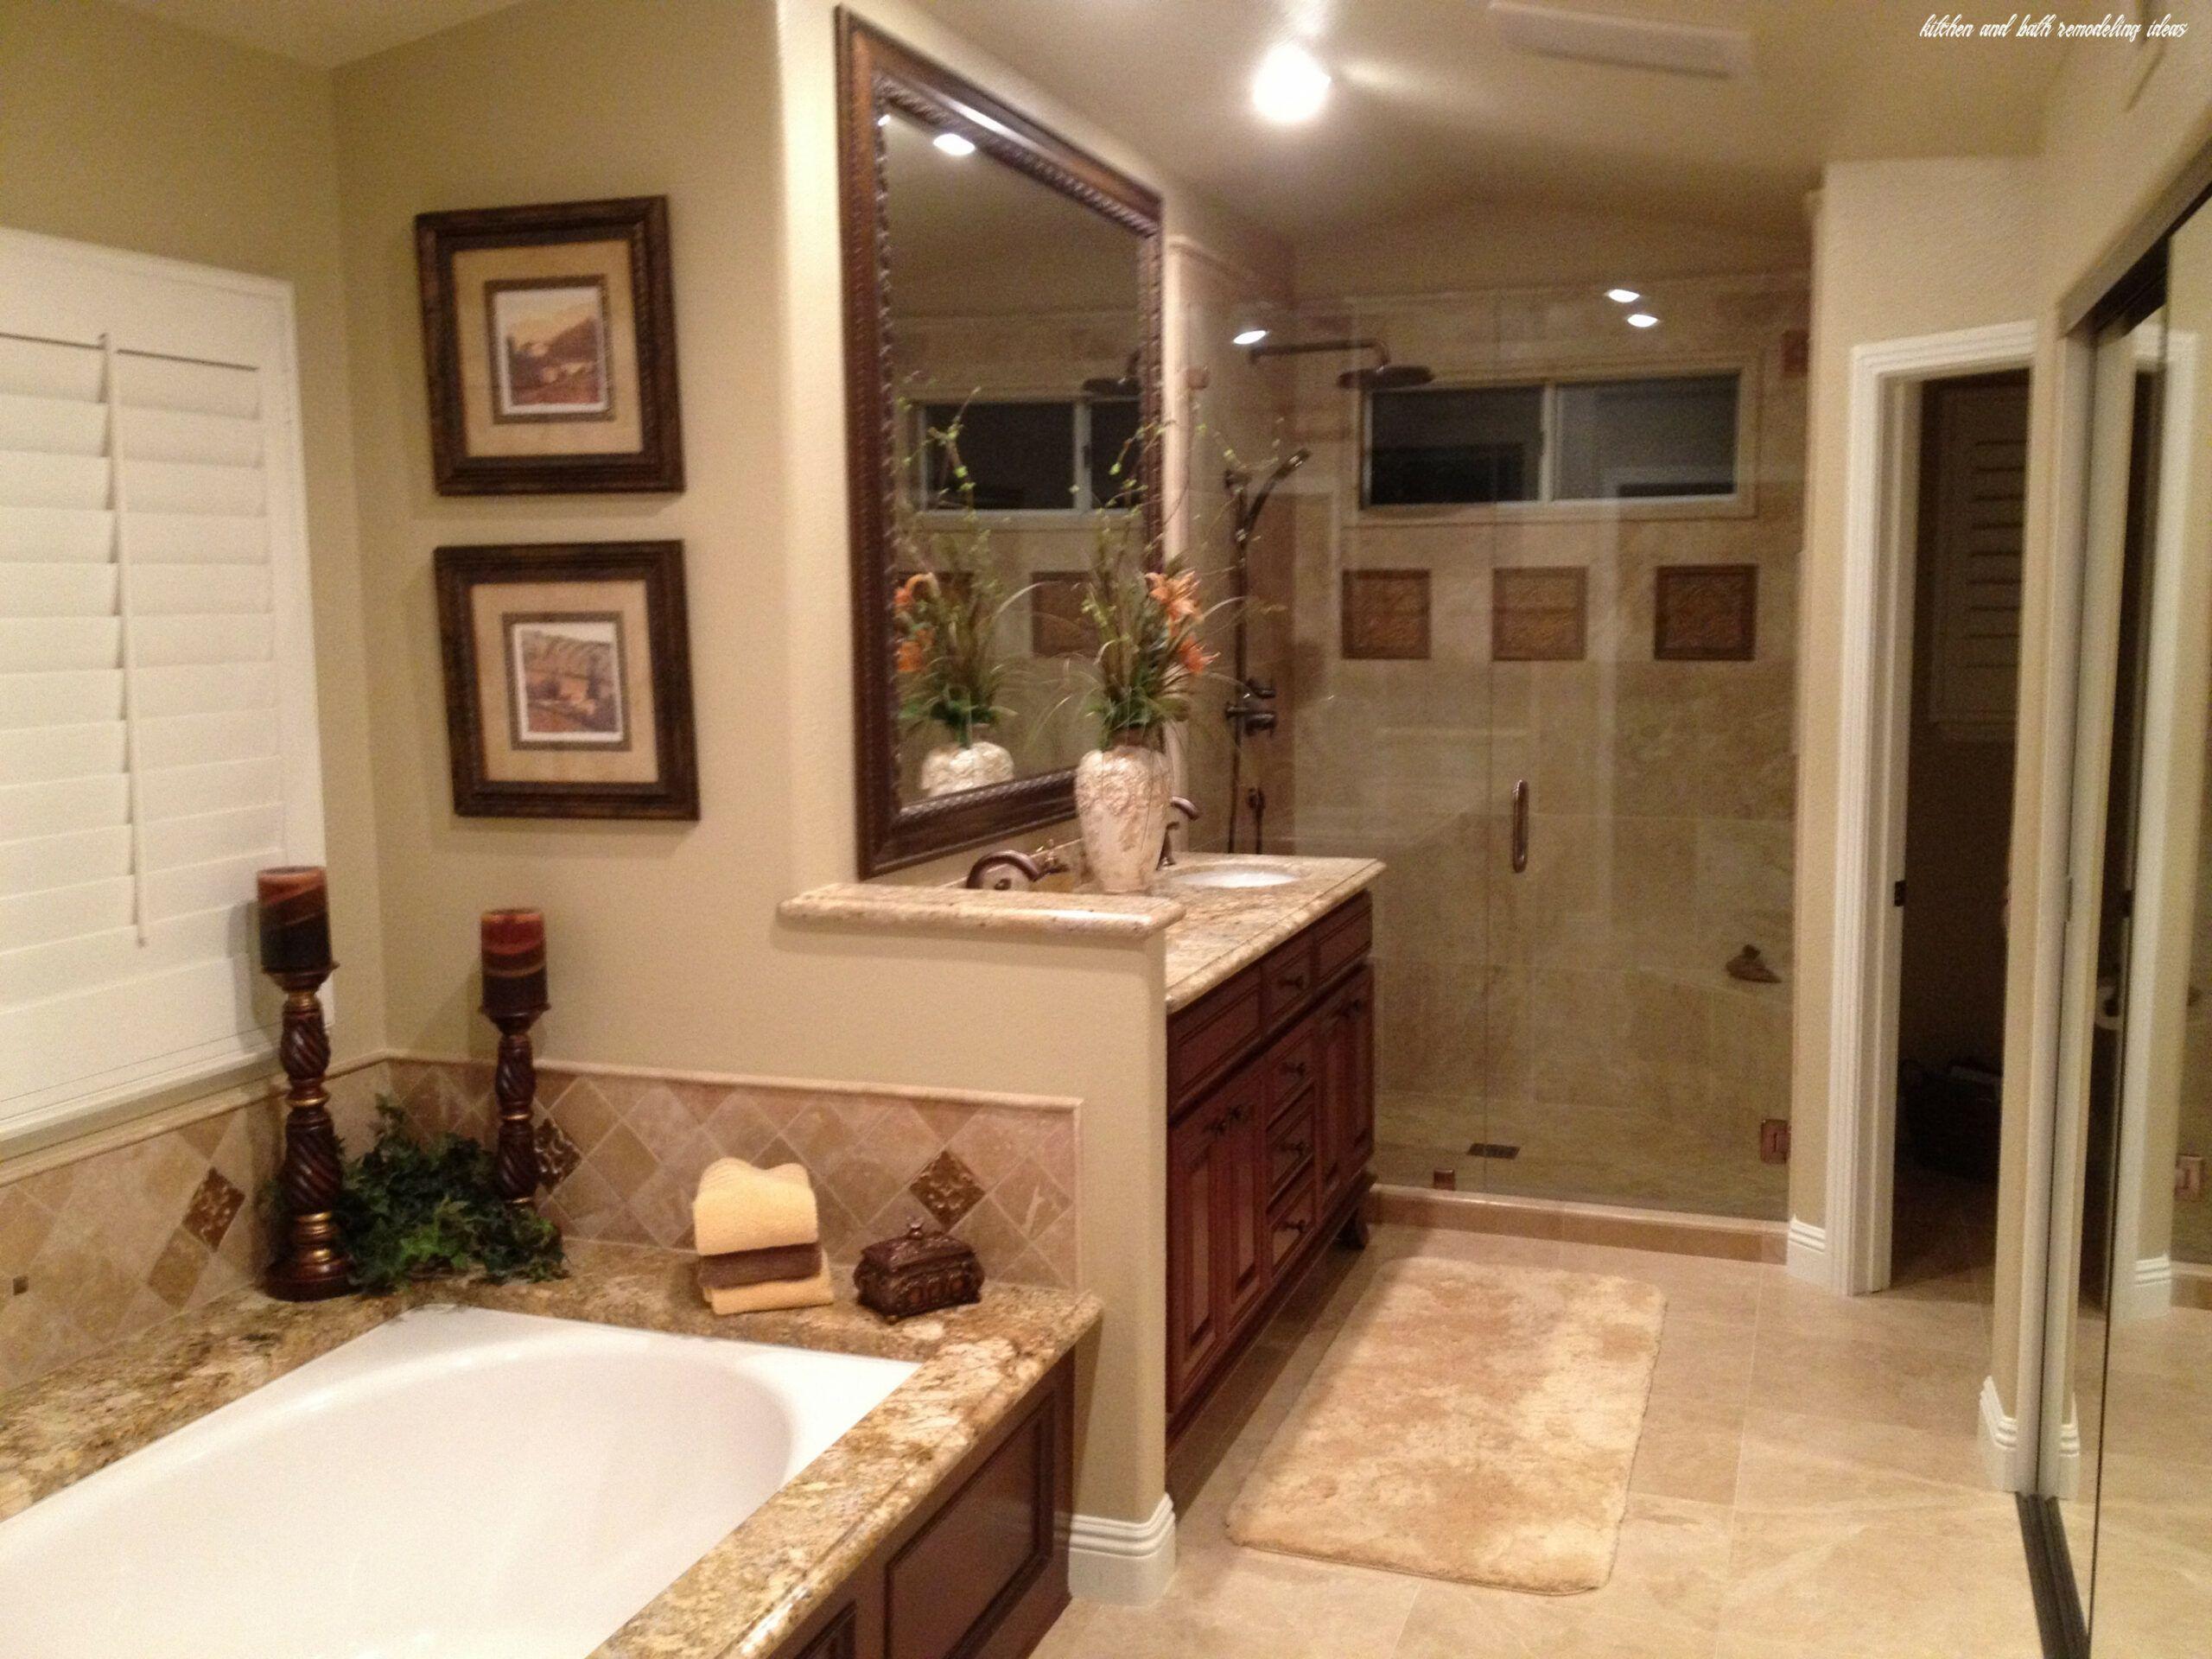 Remodeling Bathroom Average Cost Bathroom Remodel Master Small Bathroom Remodel Bathrooms Remodel